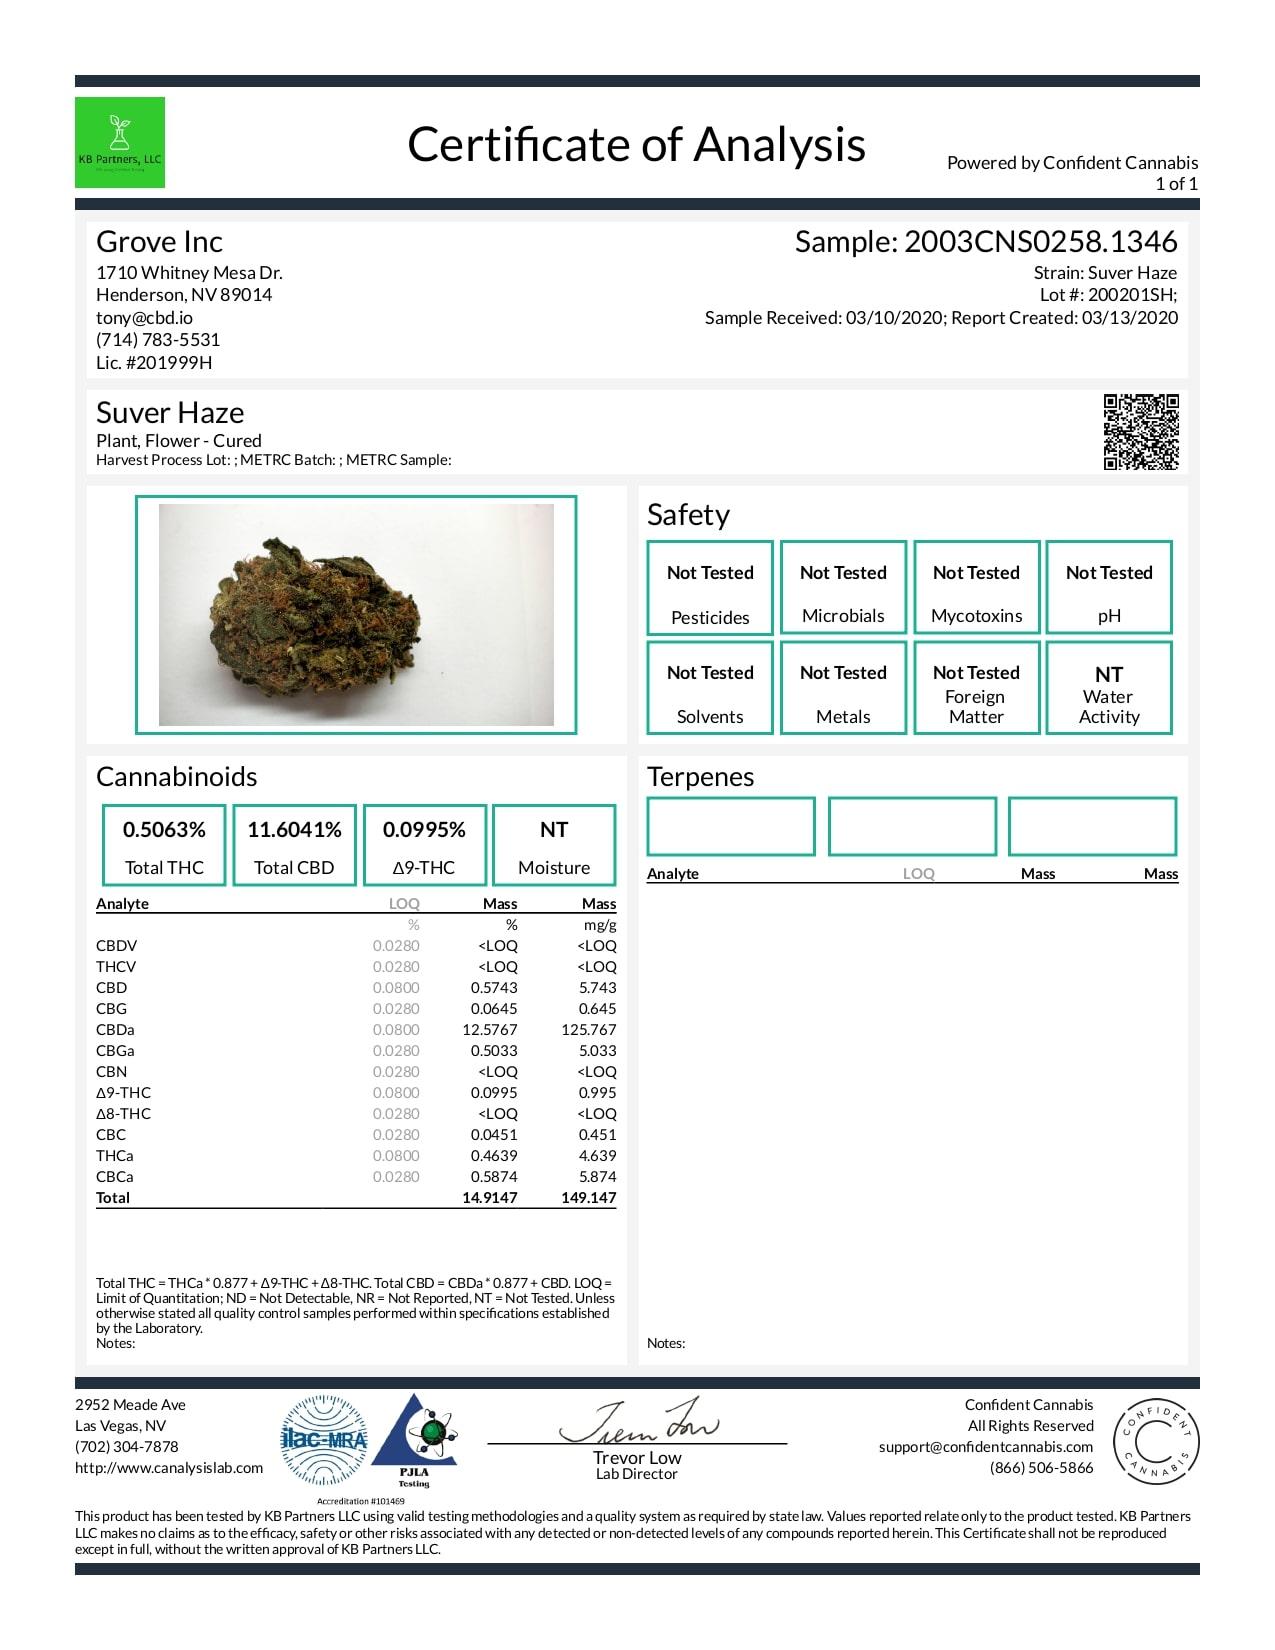 LOOT CBD Hemp Flower Suver Haze Lab Report